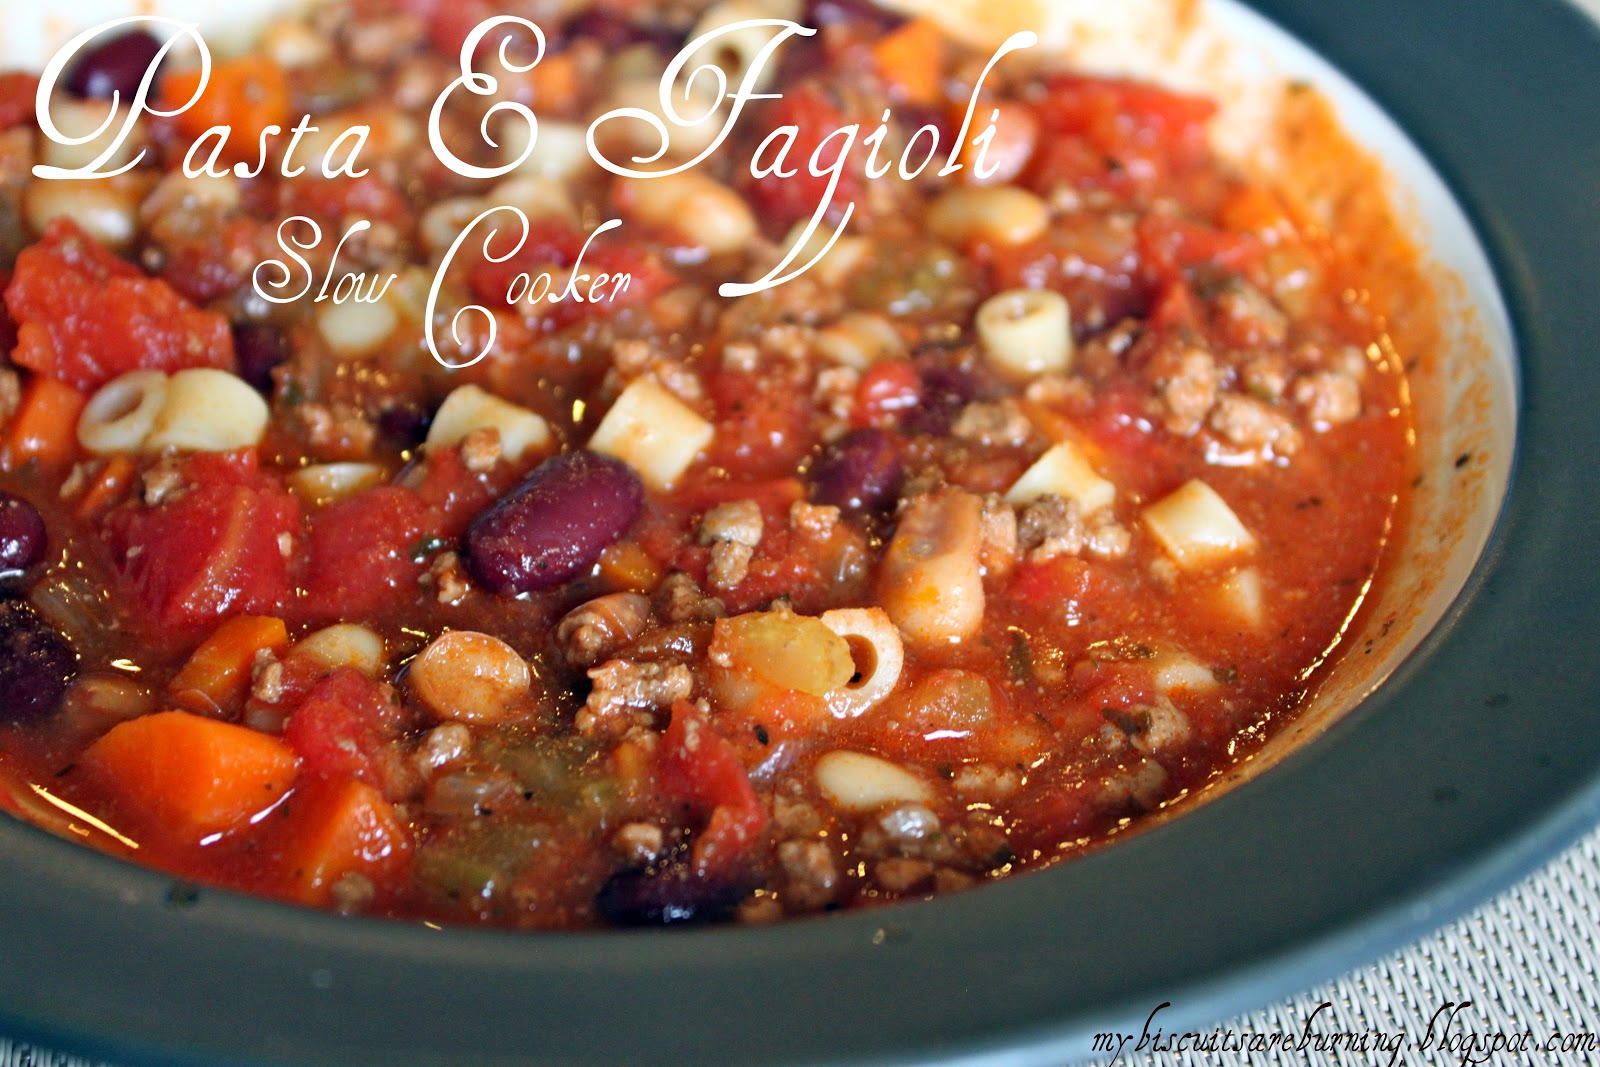 30-Minute Pasta And Kidney Bean Soup (Pasta E Fagioli) Recipes ...